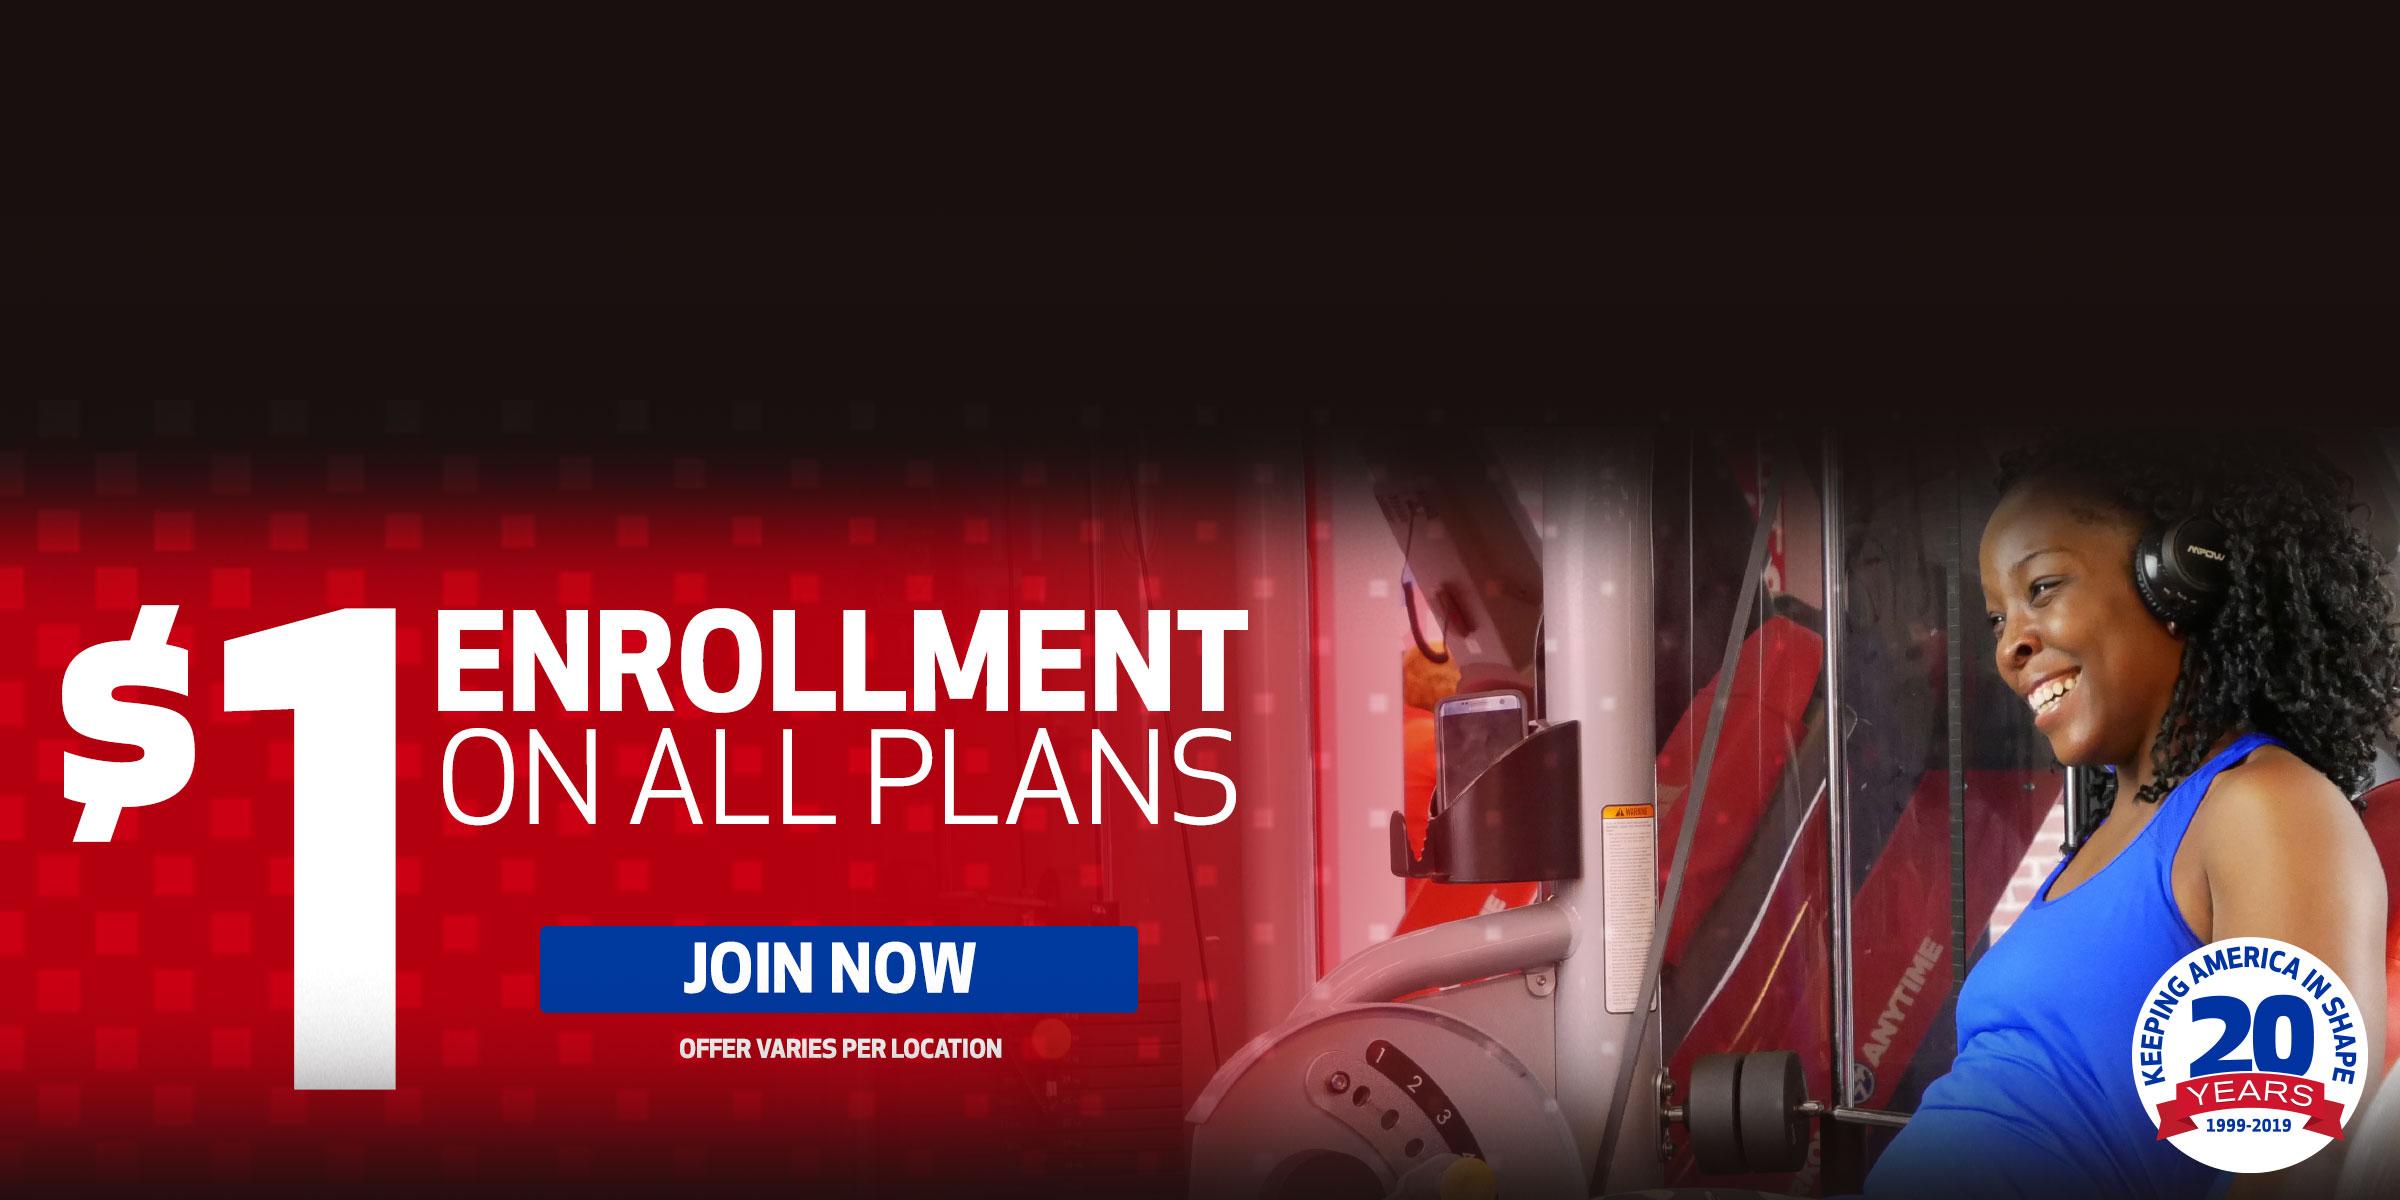 $1 Enrollment on All Plans